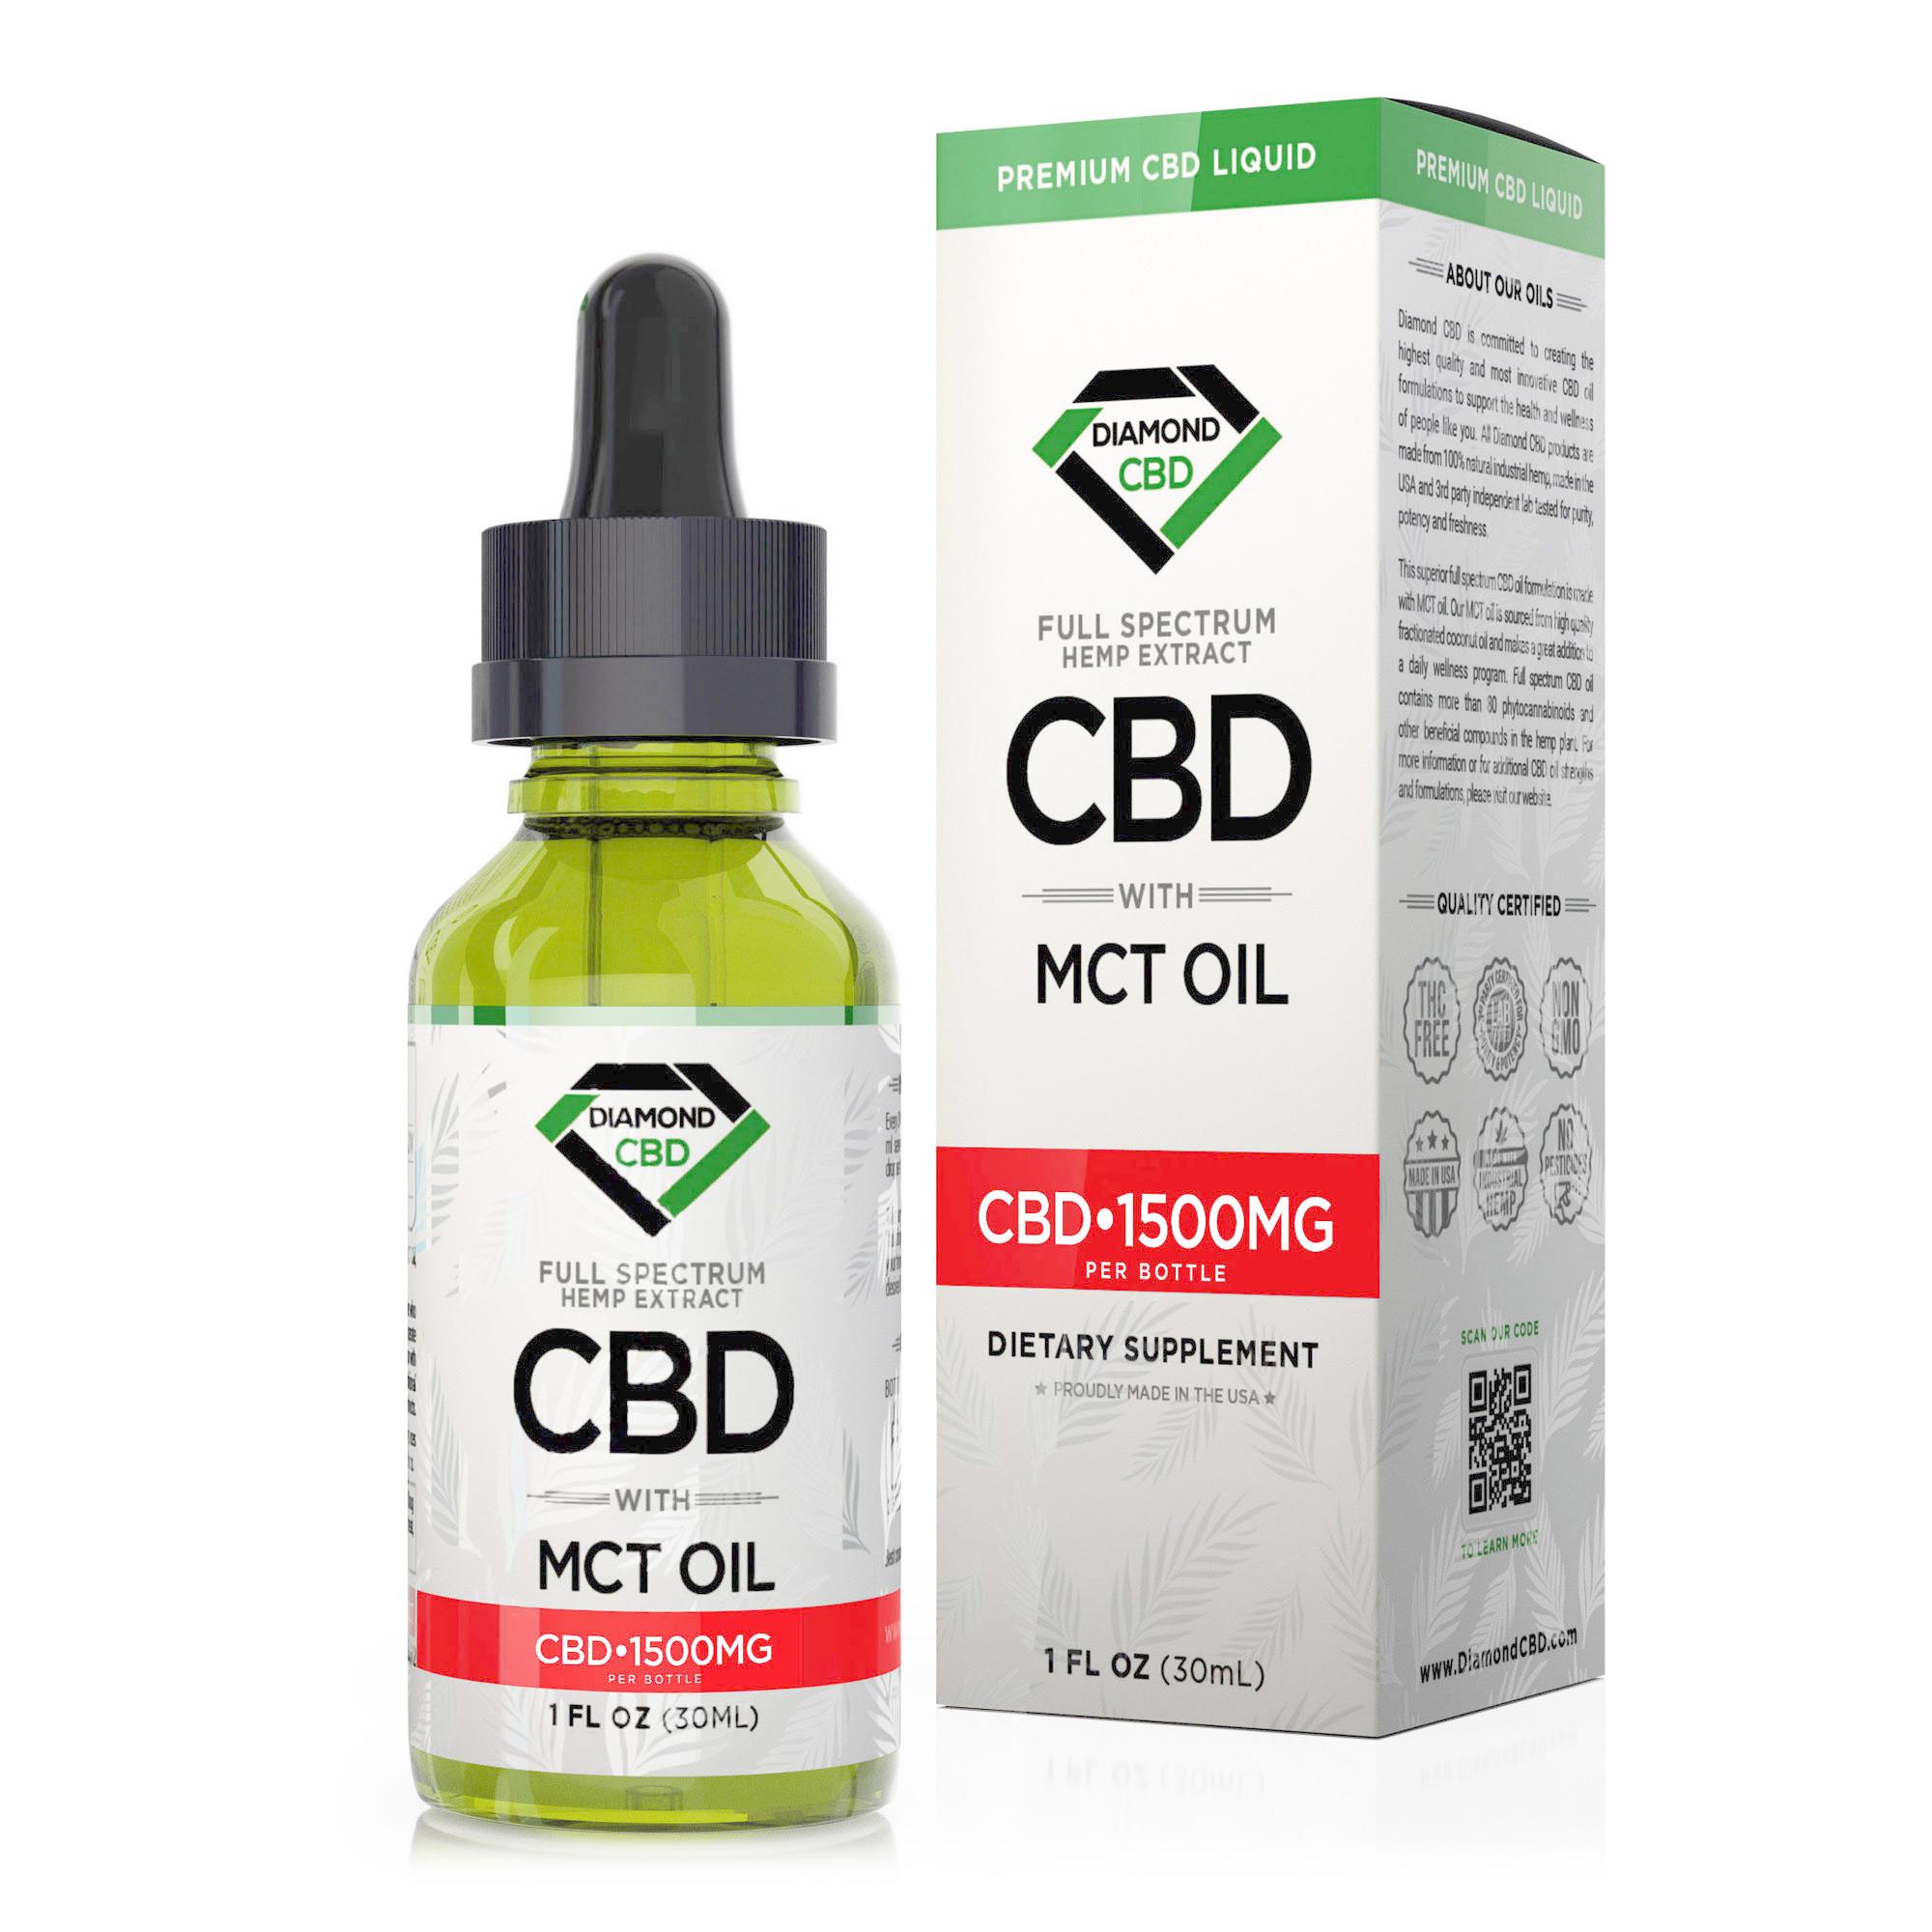 Diamond CBD Full Spectrum MCT Oil - 1500mg (30ml)